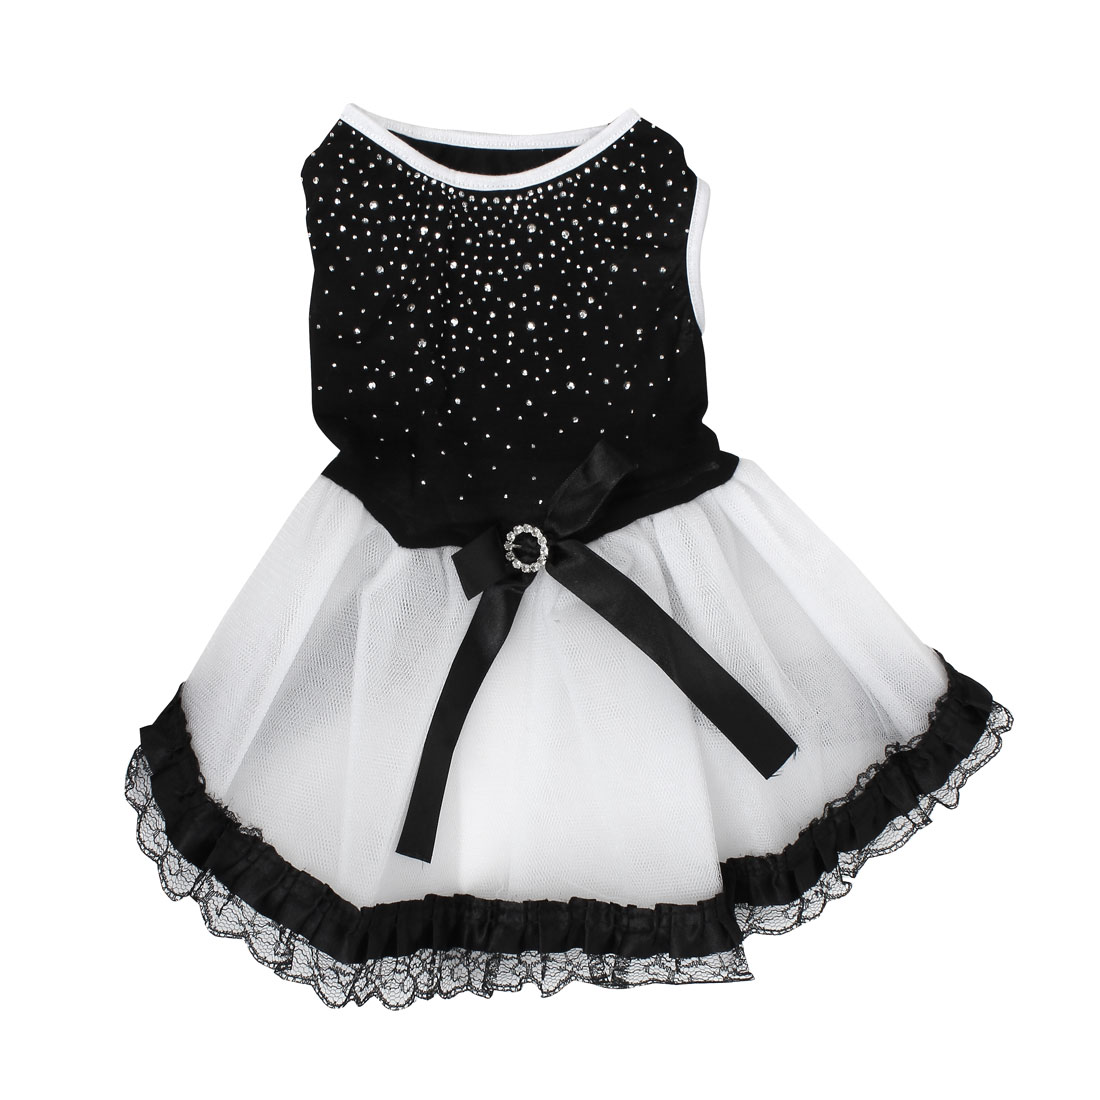 Pet Dog Doggie Rhinestone Inlaid Bowknot Decor Ballet Dress Skirt Black Size M